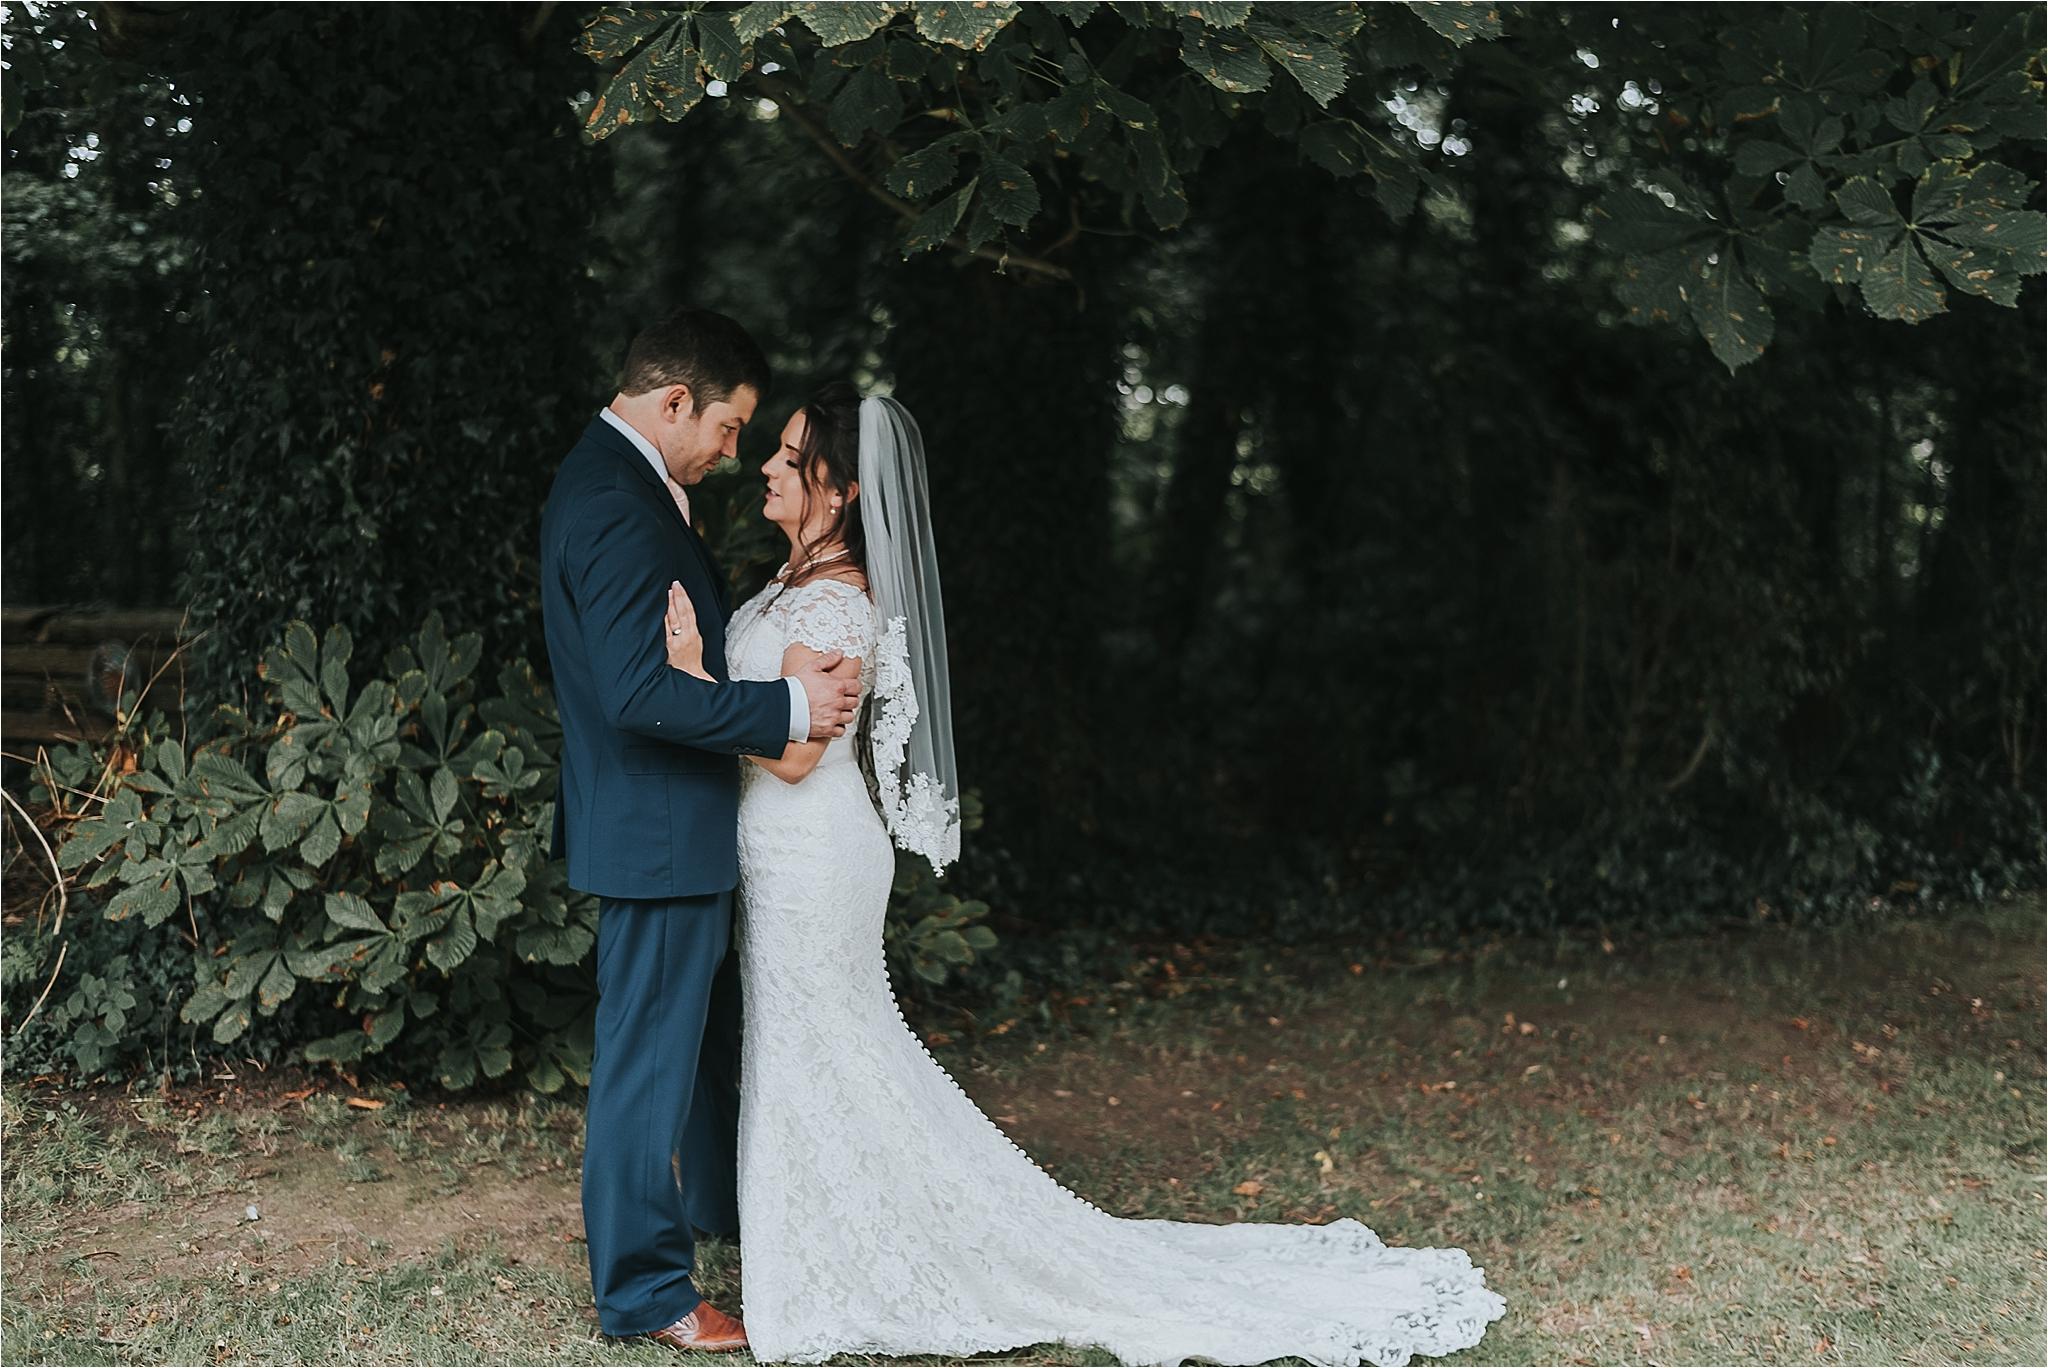 thevilla+lancashire+wreagreen+wedding+photographer38.jpg